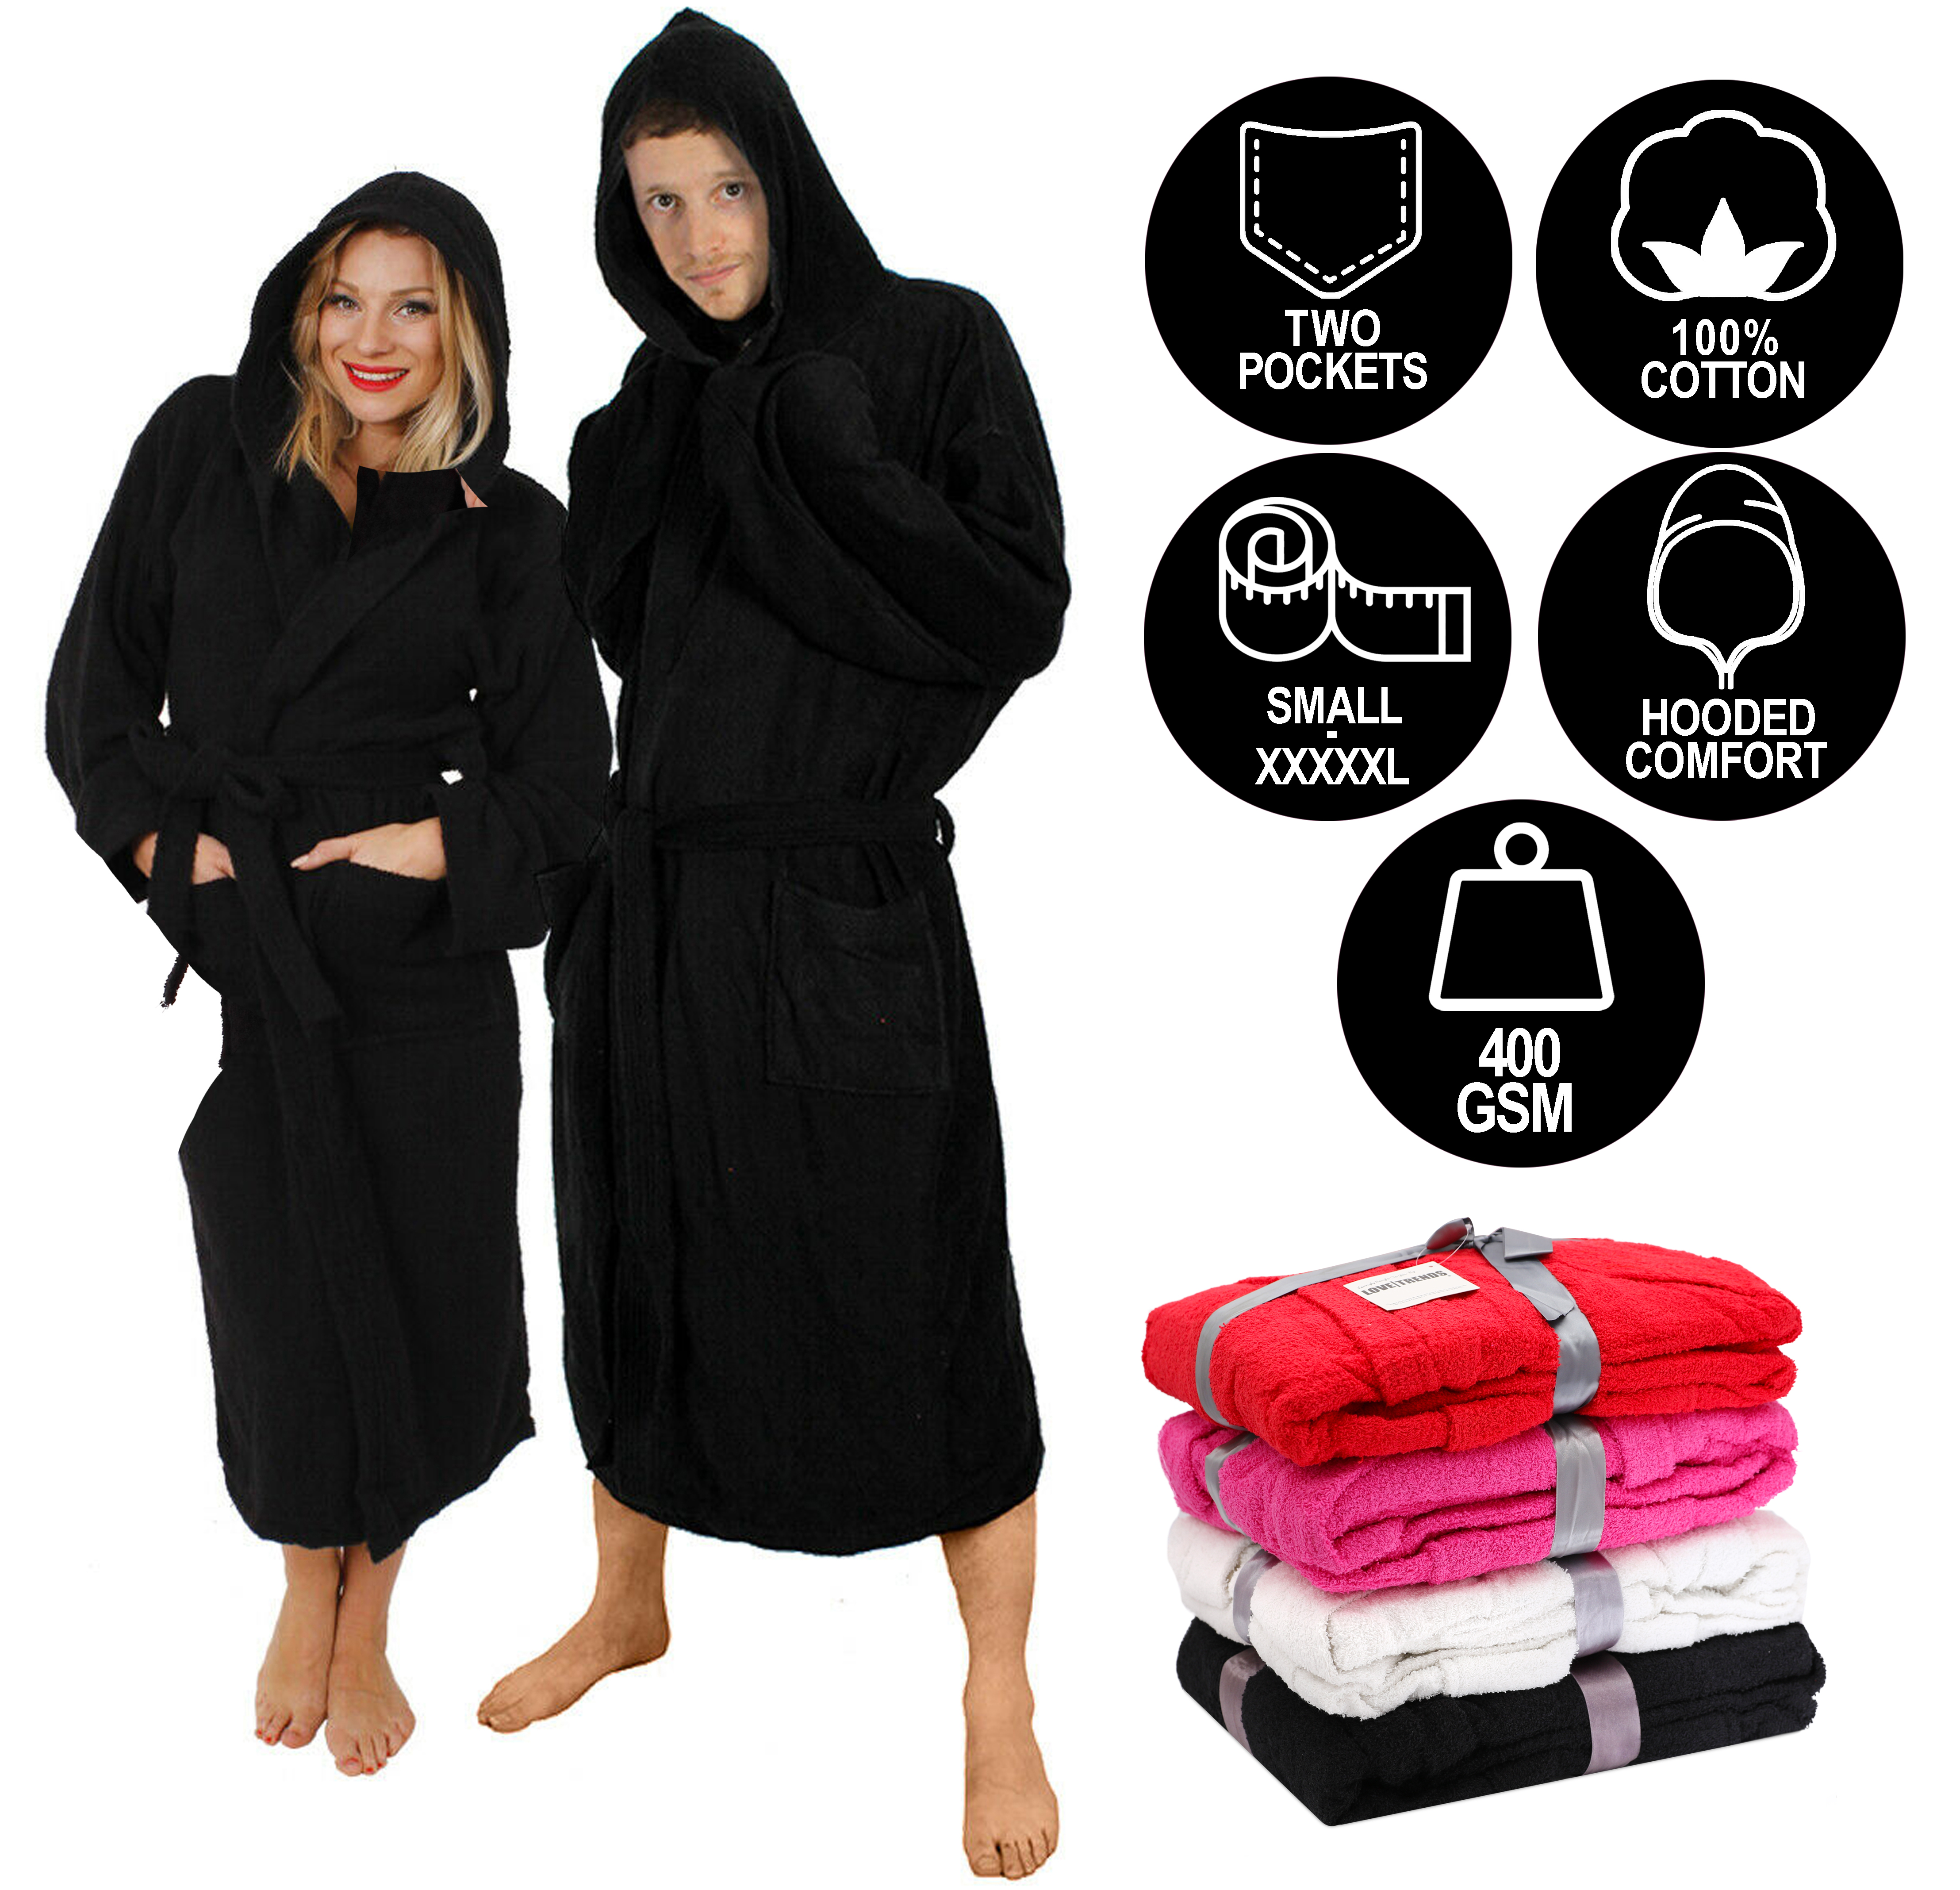 Black Hooded Bathrobe 100 Cotton Heavy Towelling Unisex Hospital Gown S Xxxxl Ebay